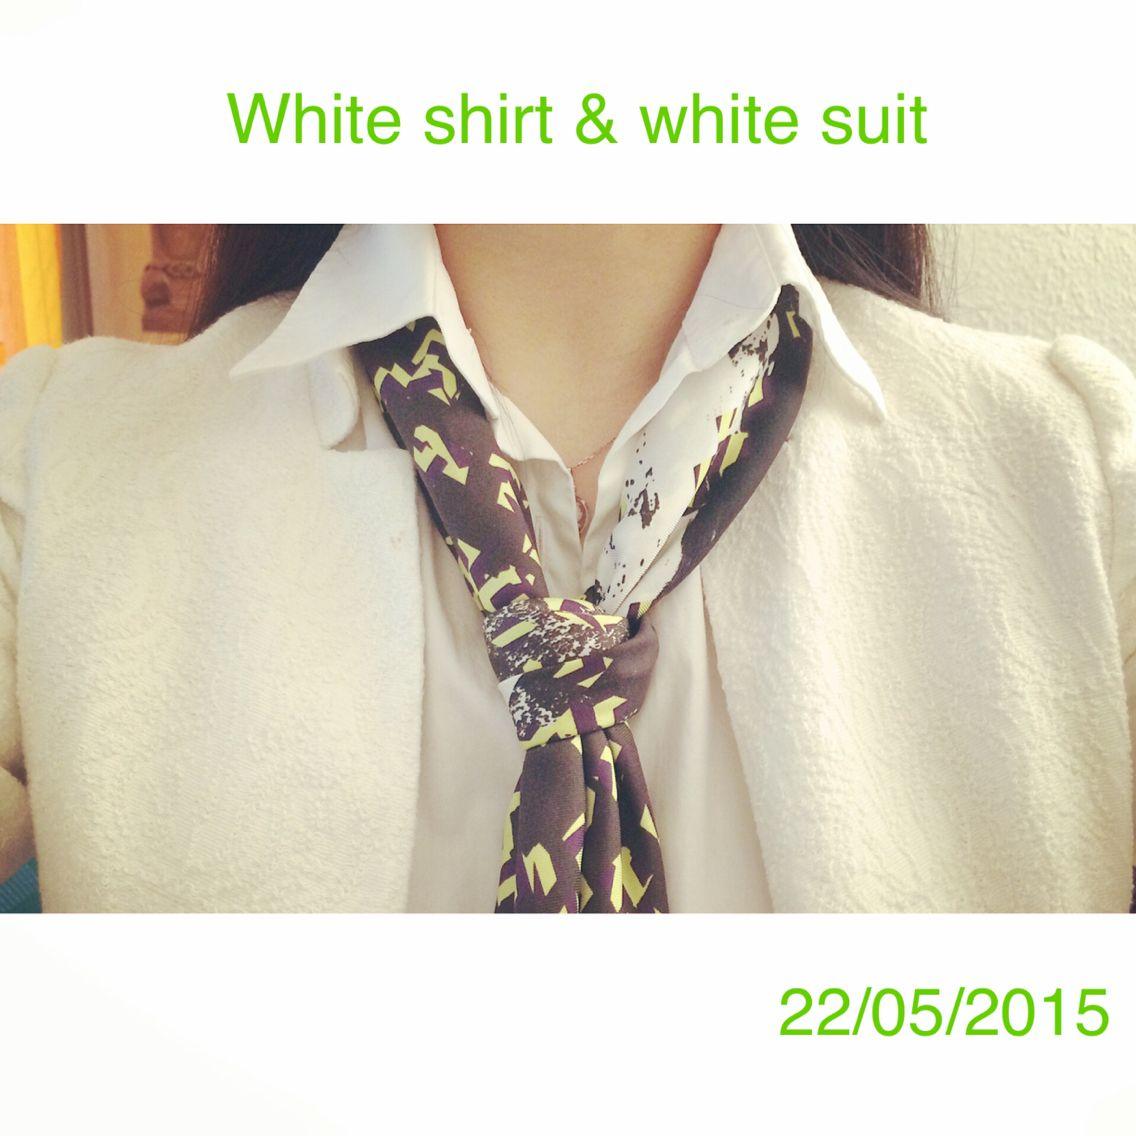 white shirt & white suit